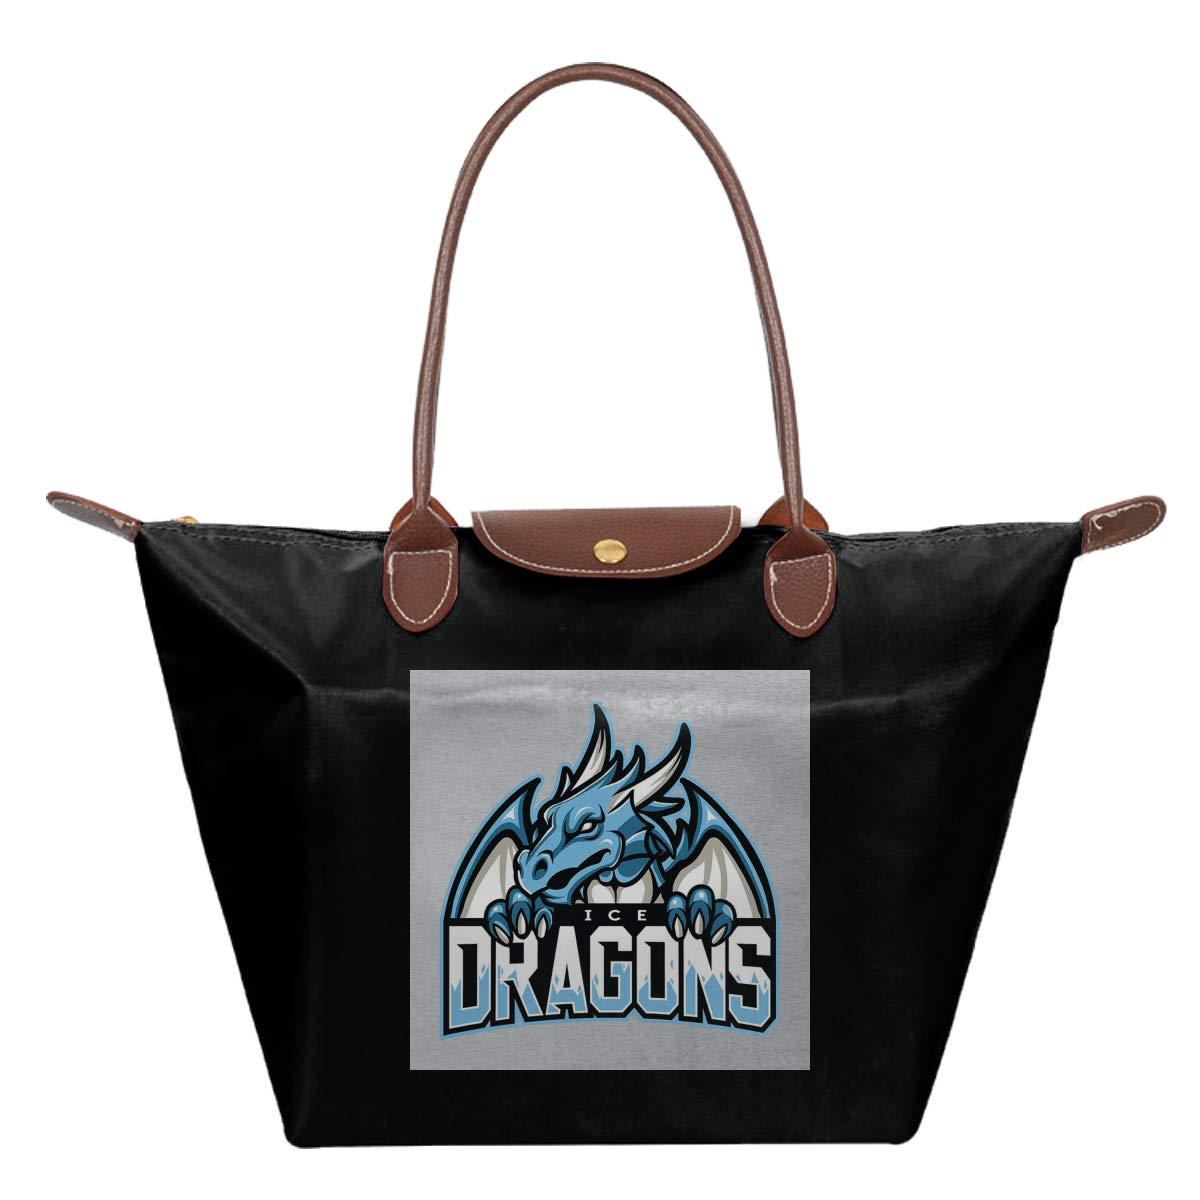 Ice Dragons Nights King Game Of Thrones Waterproof Leather Folded Messenger Nylon Bag Travel Tote Hopping Folding School Handbags